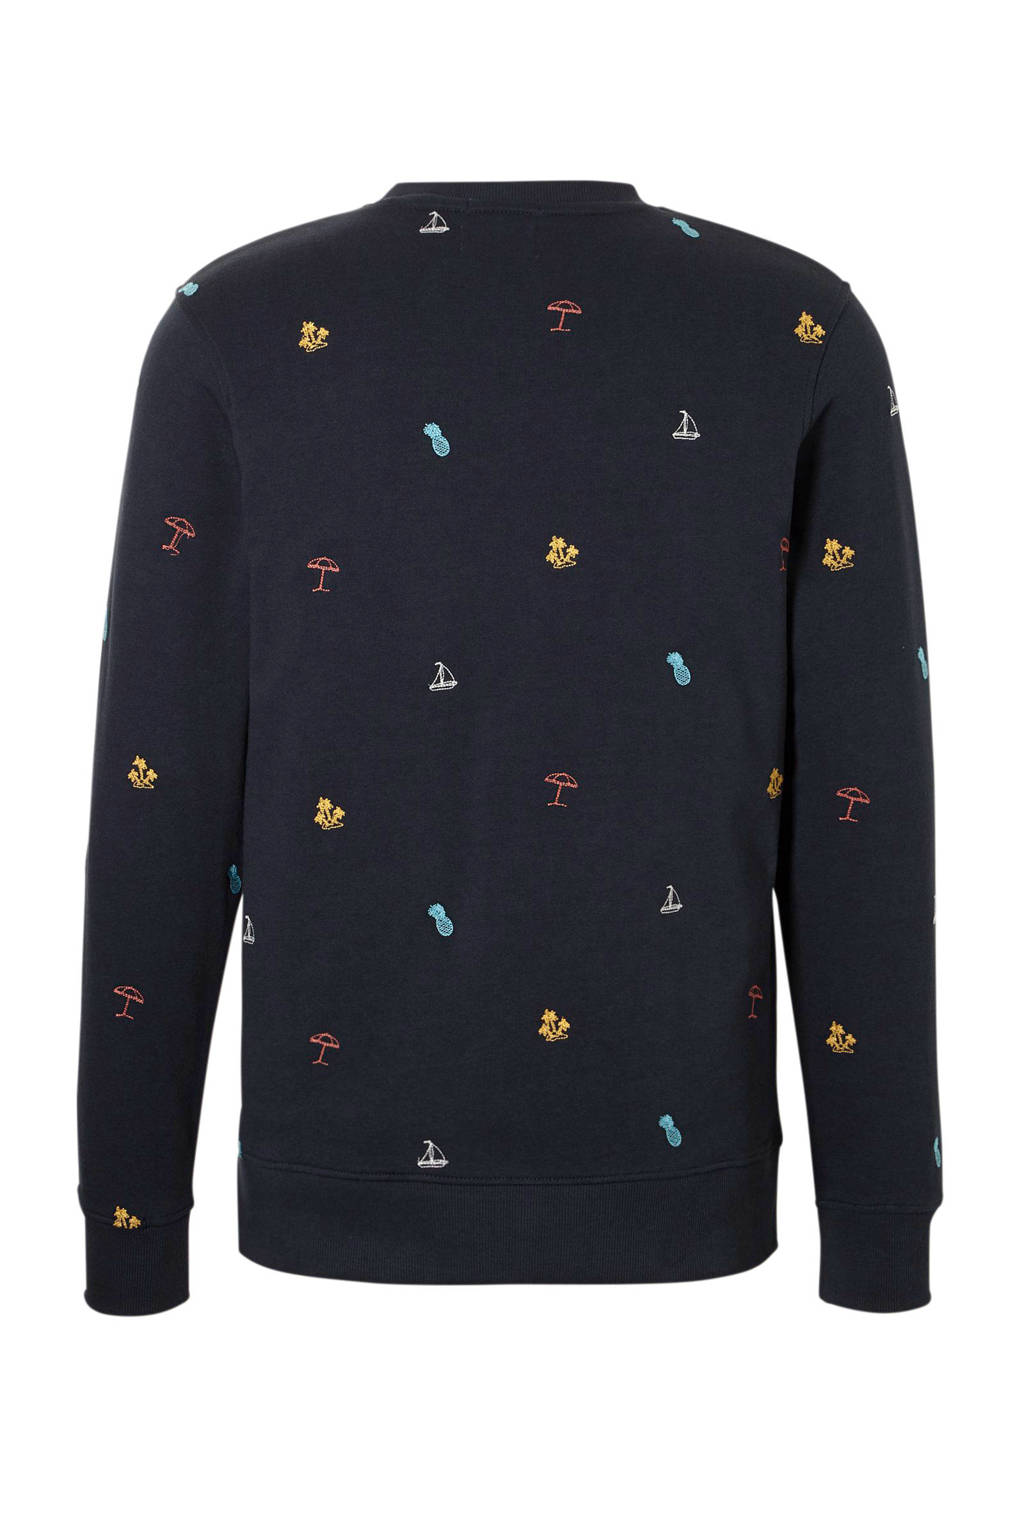 JACK & JONES ORIGINALS sweater met borduursels marine, Marine